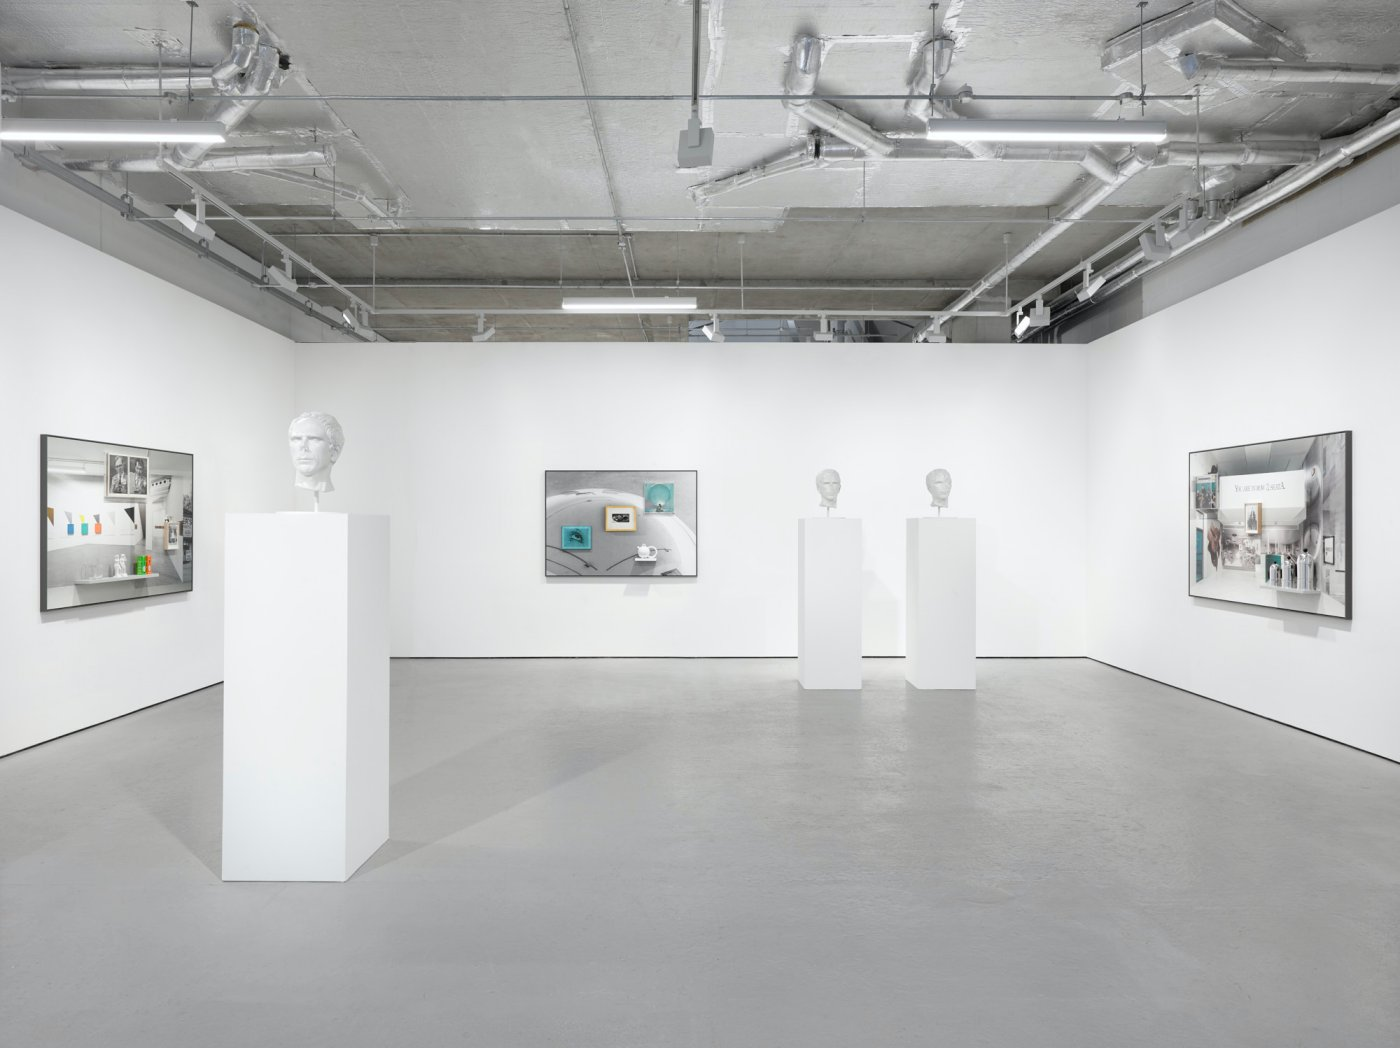 Lisson-Gallery-Cork-St-Jonathan-Monk 2